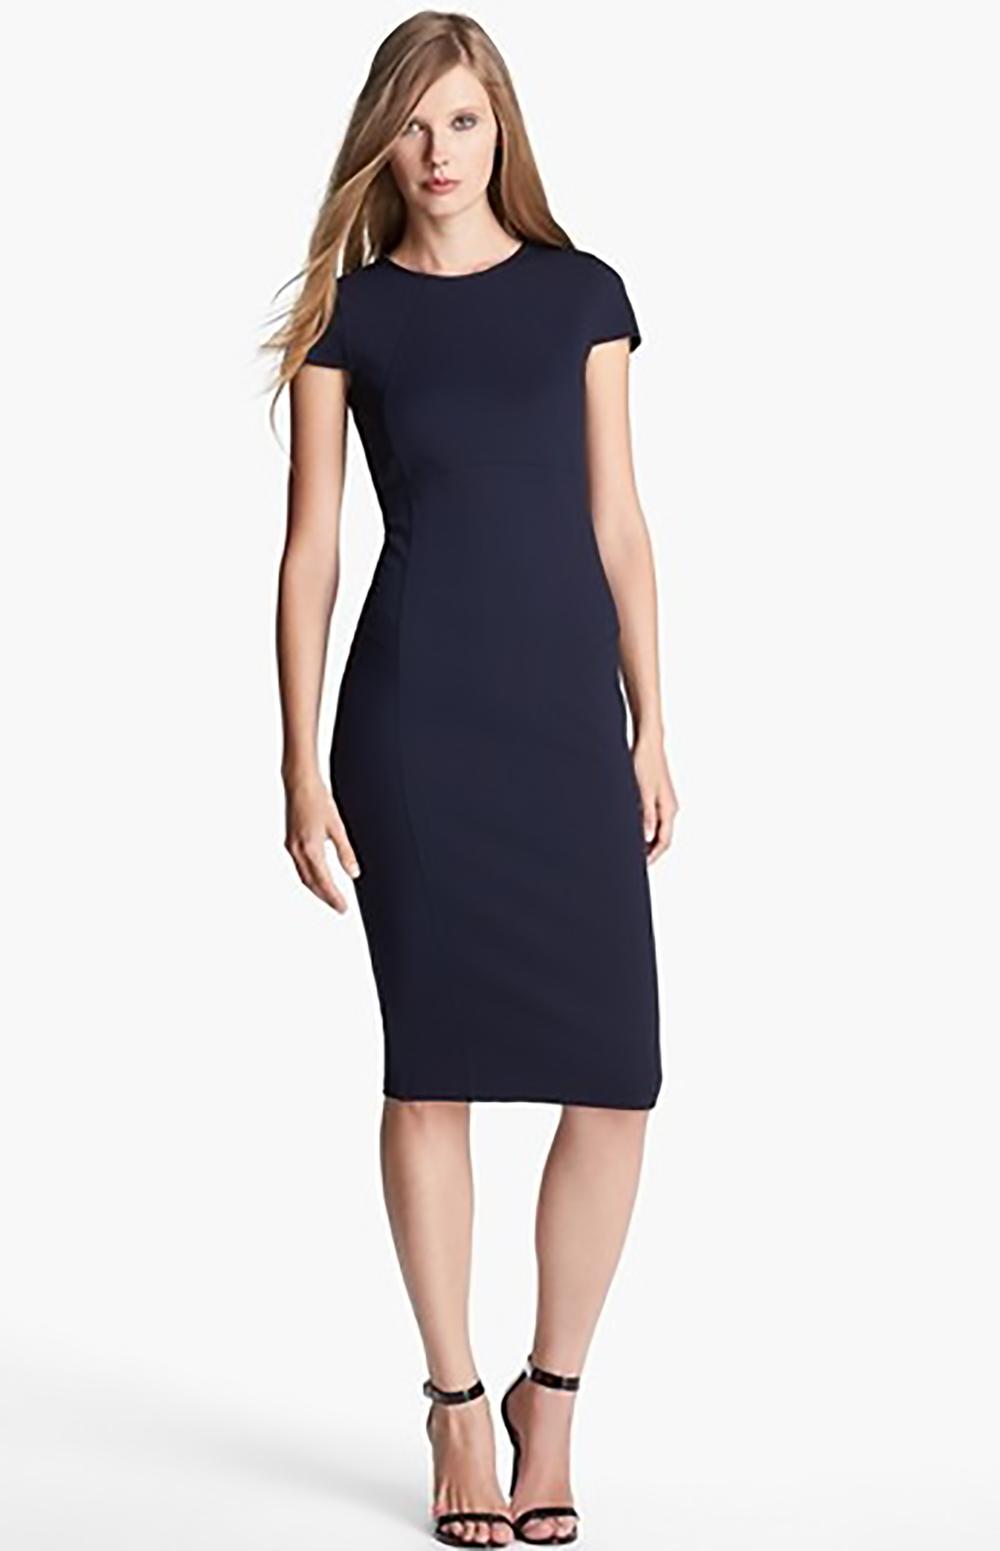 nordstrom felicity & coco seamed pencil dress sheath dress 1500.jpg